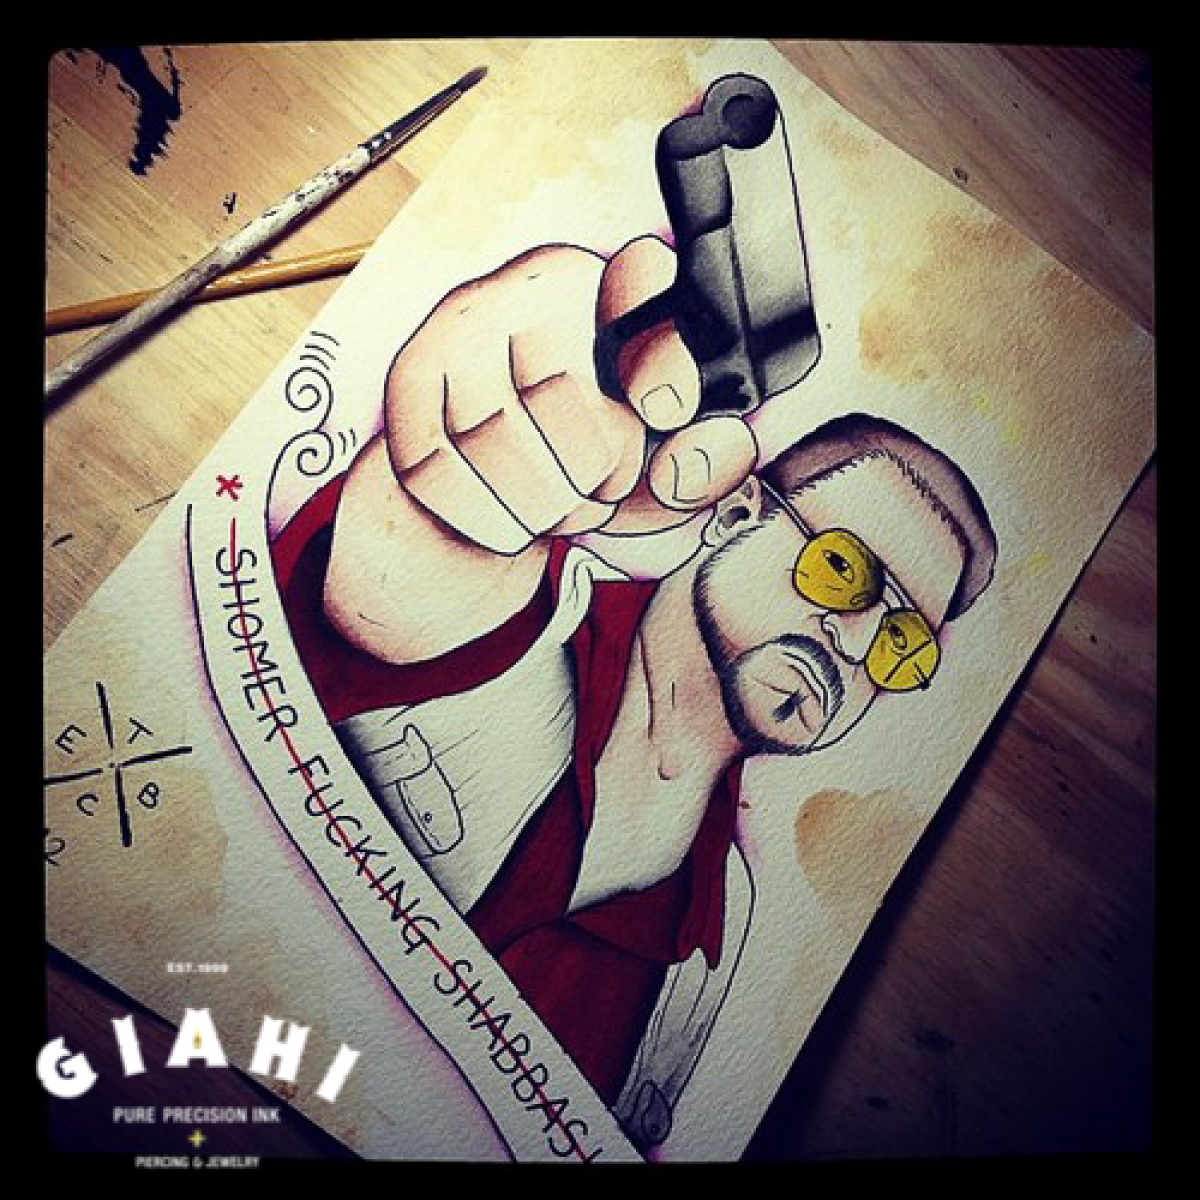 Pointed Gun Shomer Fucking Shabbash Lettering tattoo by Elda Bernardes